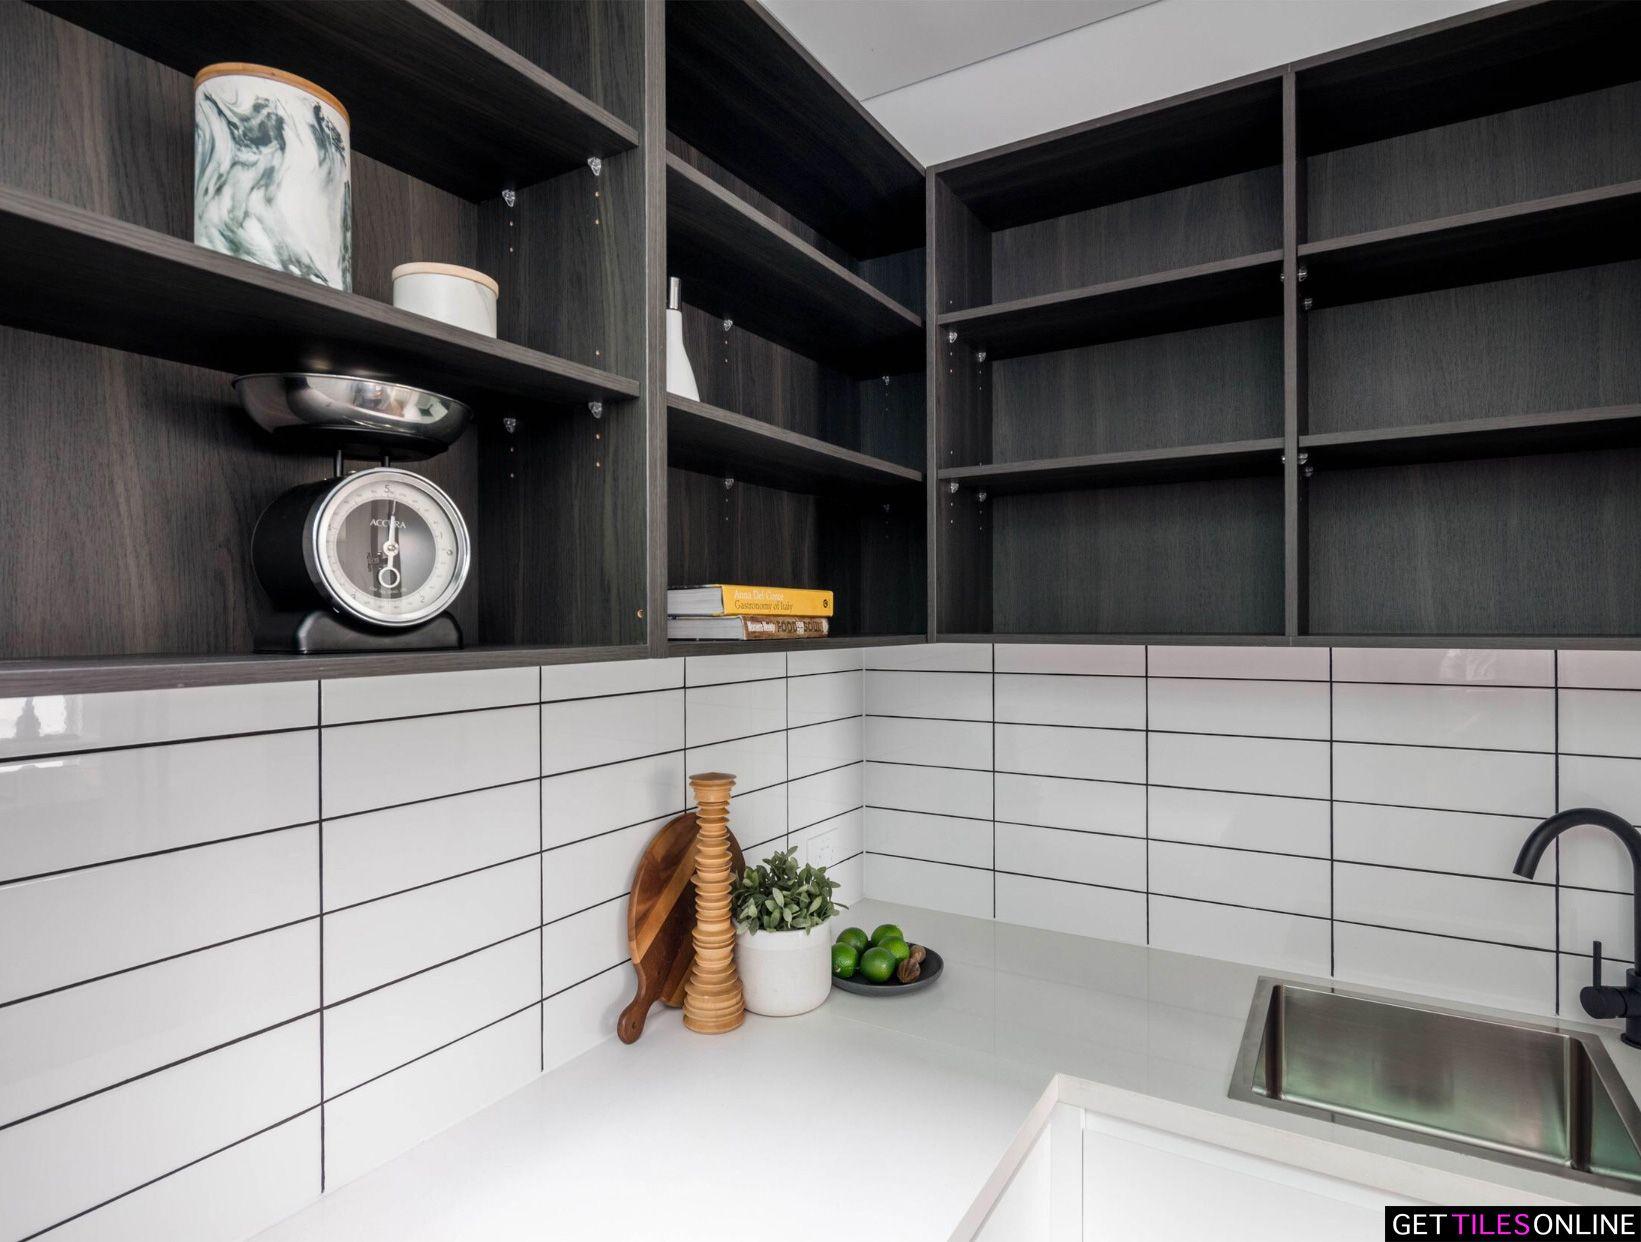 Cheapest 100x300 White Gloss Wall Tile 14 90 M2 Get Tiles Online White Walls Wall Tiles Wall Design